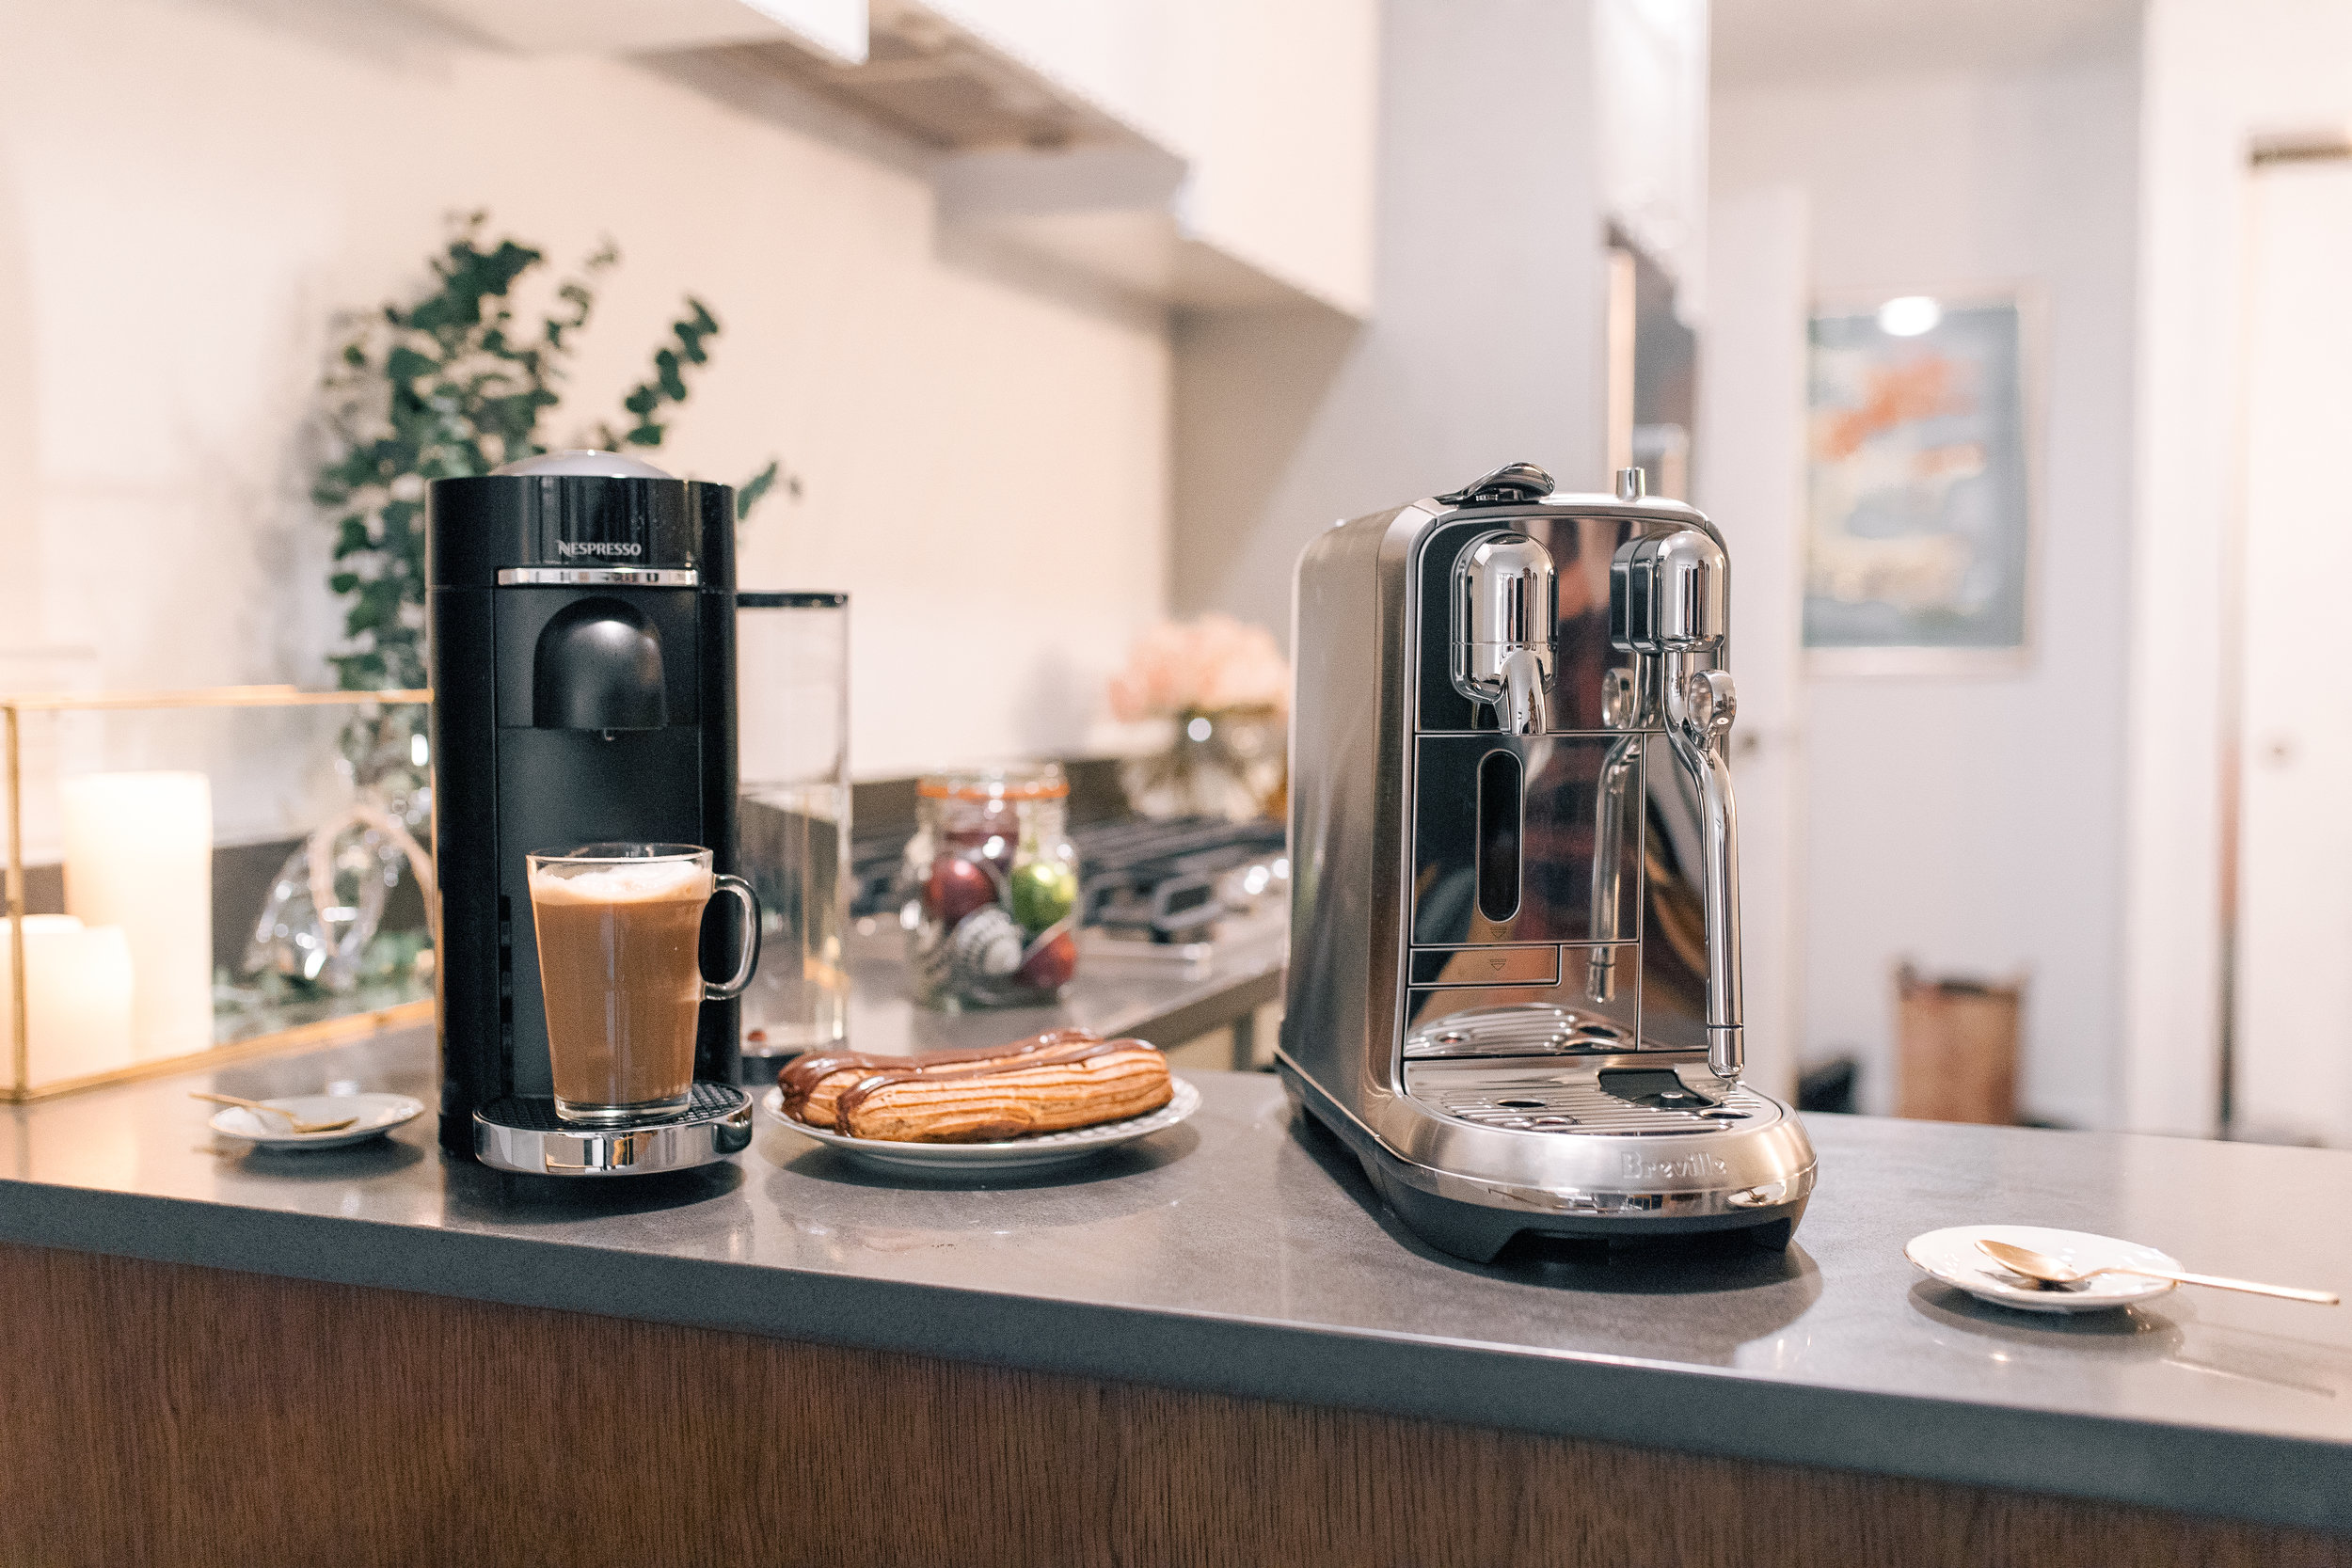 Left: Nespresso VertuoPlus Deluxe D Range Black  Right: Nespresso Creatista Plus Metal Stainless Steel